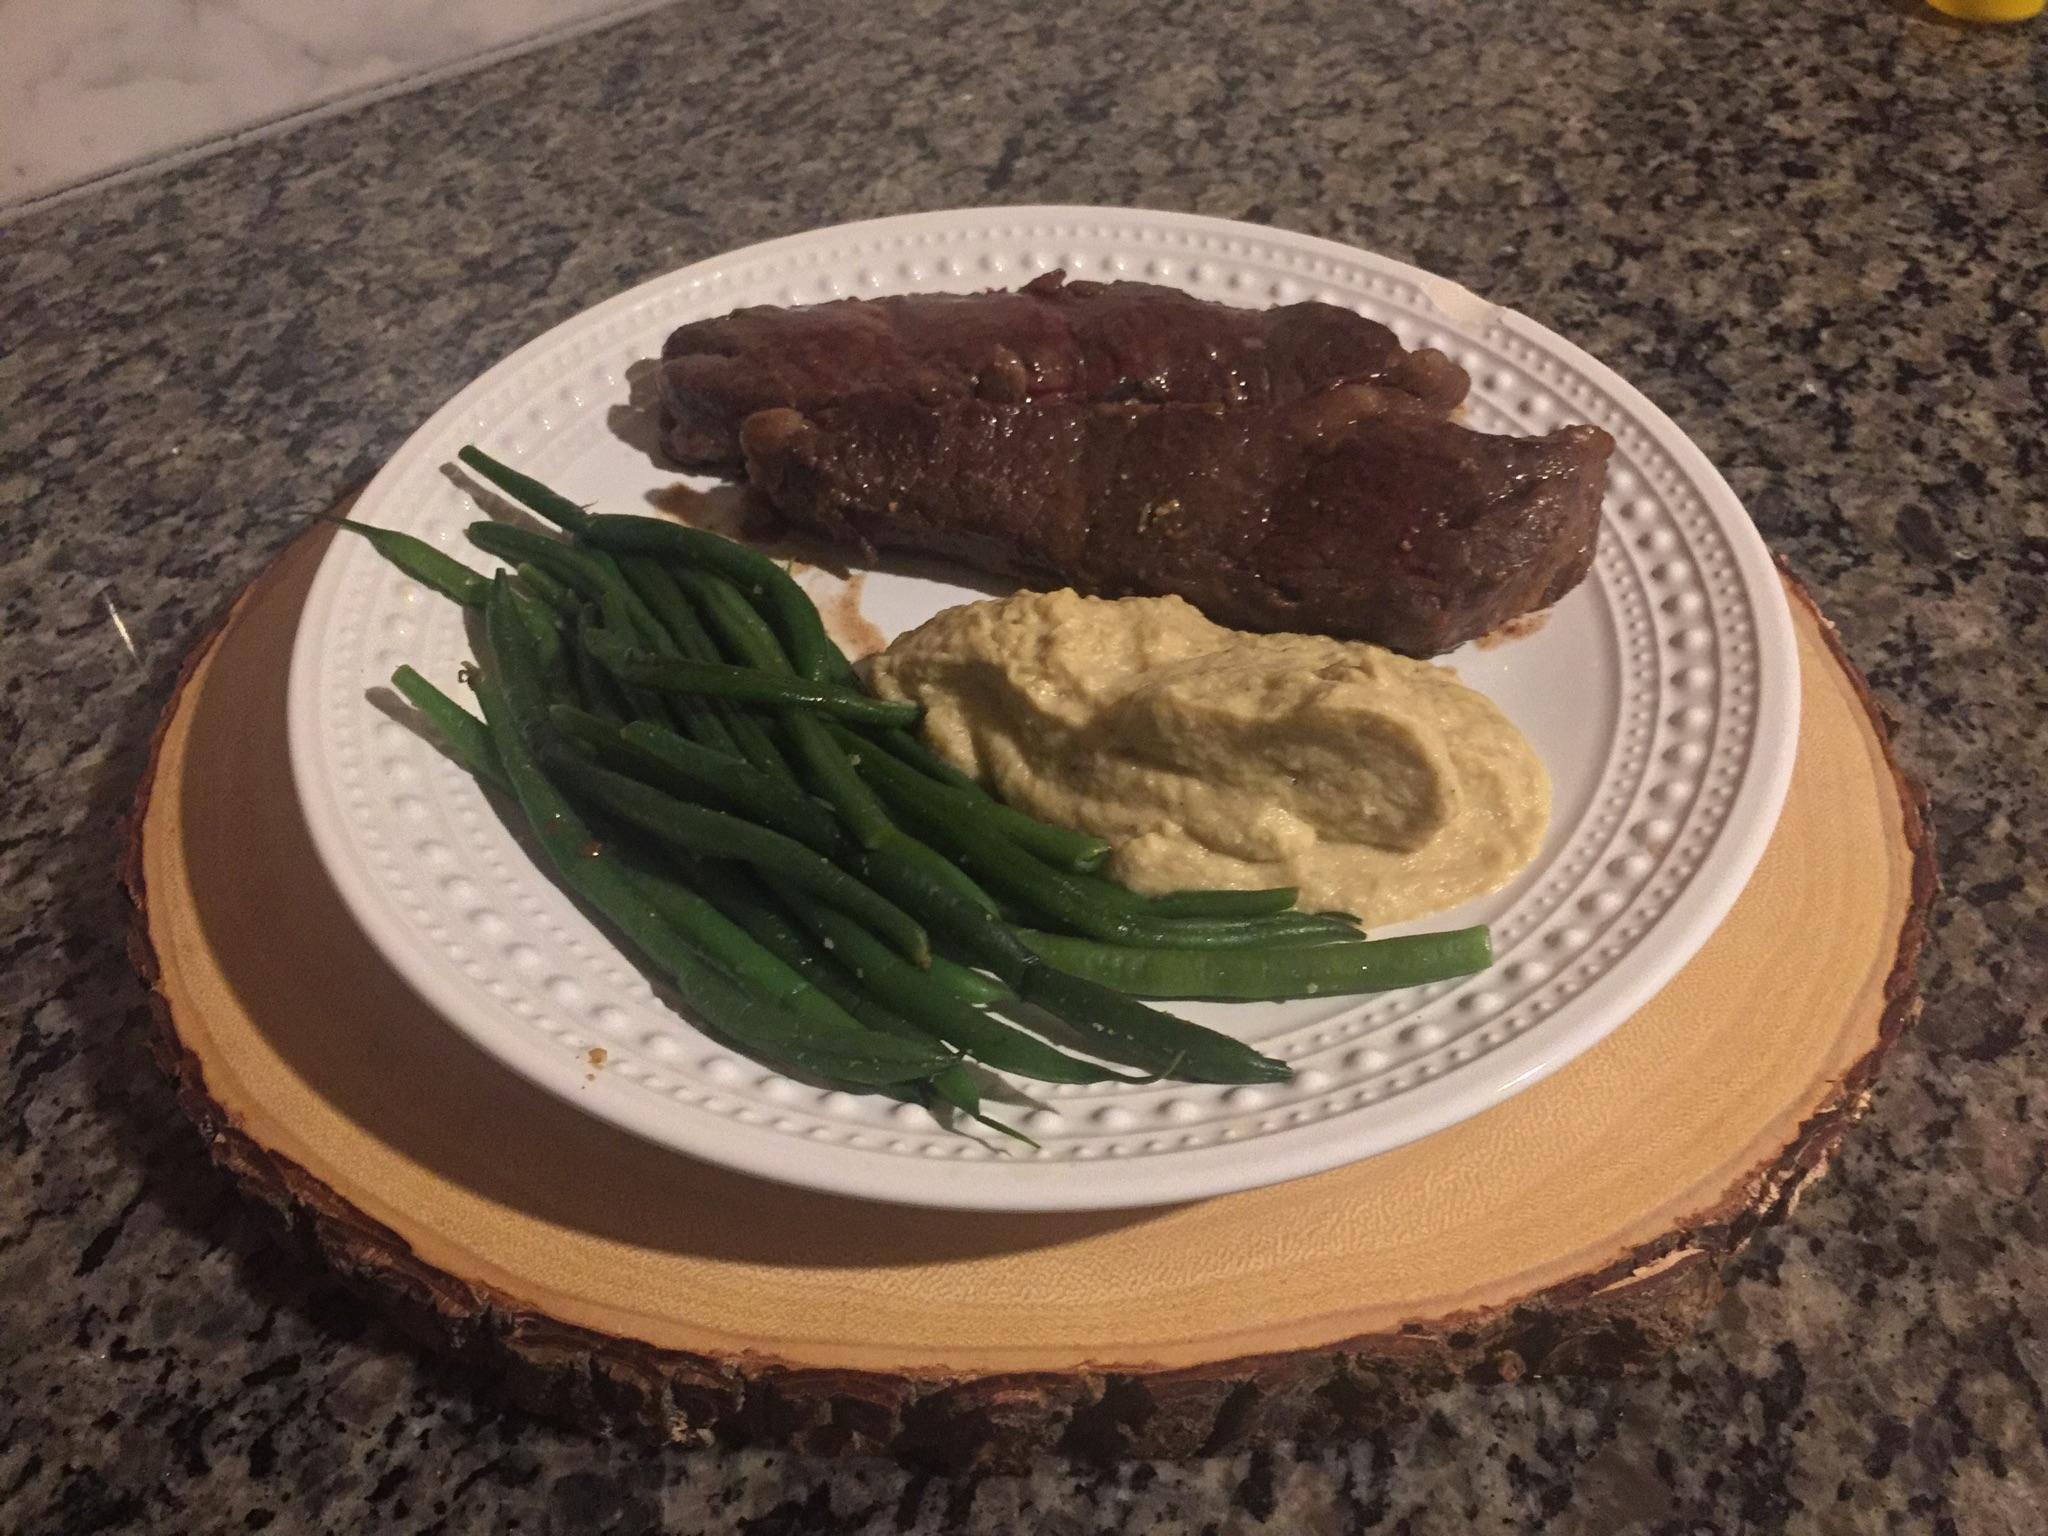 Steak, Mashed Potatoes, and Gravy